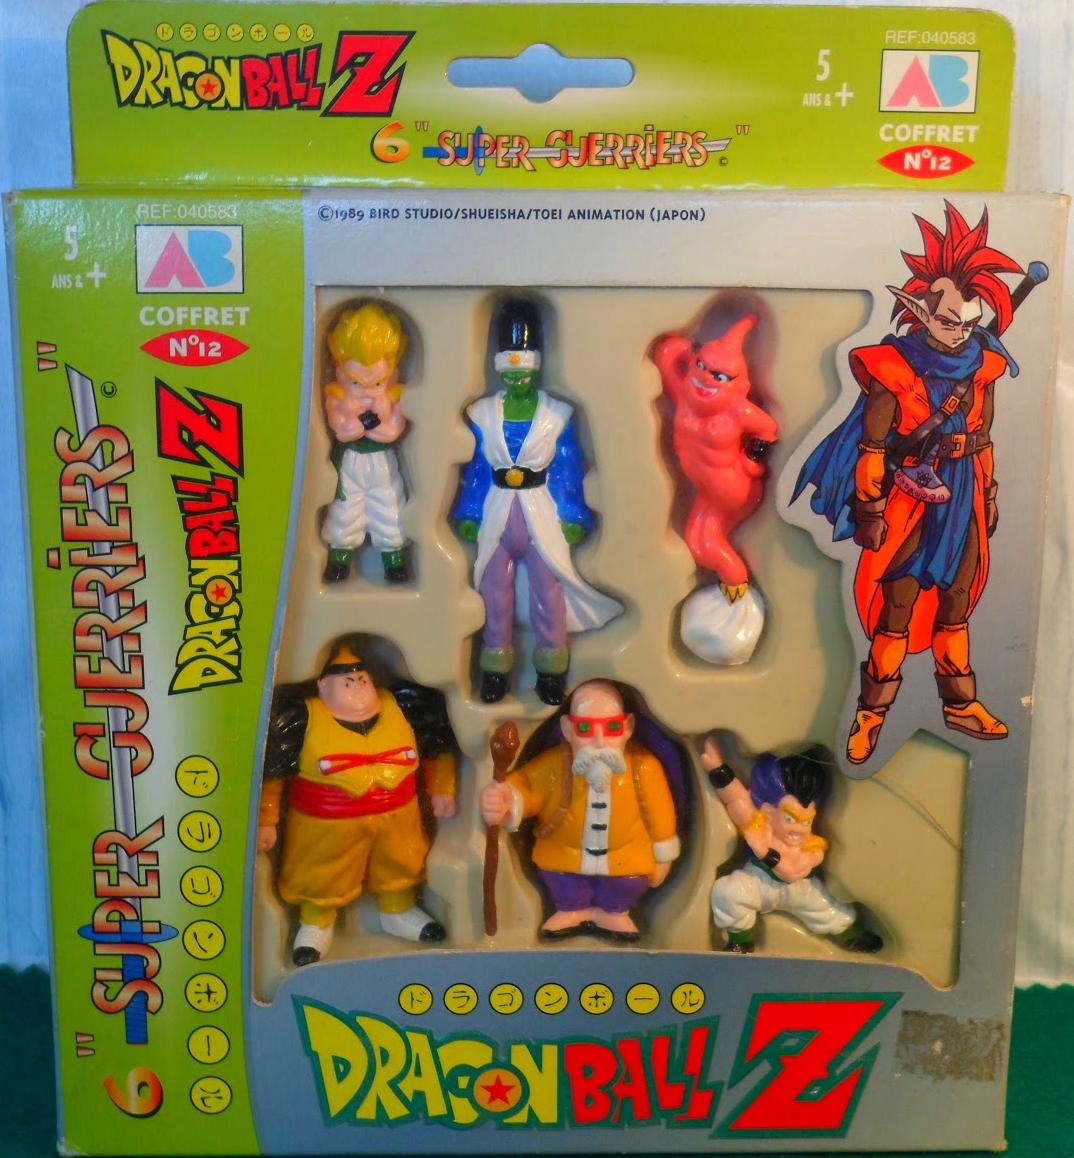 Bandai Dragon ball Z Kai 02 HG DG 2 Digital Grade Gashapon Figure Android 19